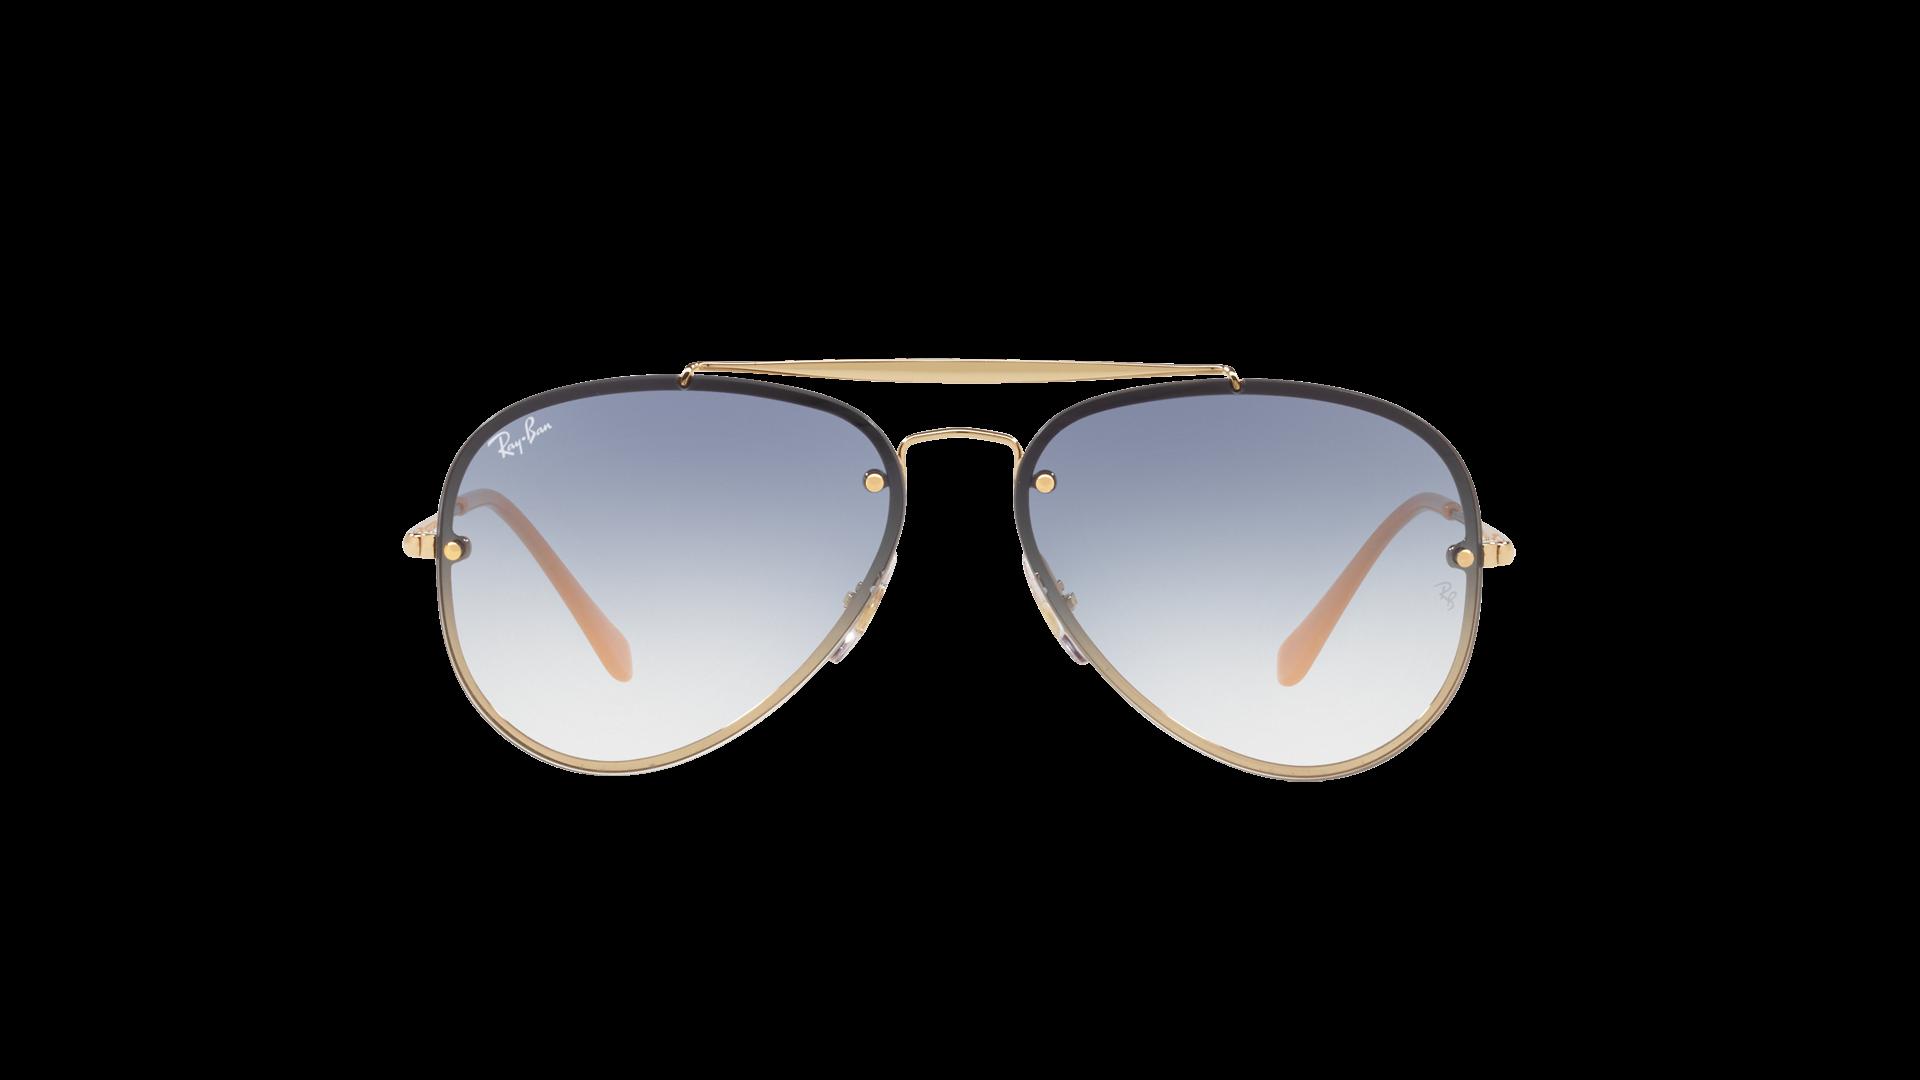 11c8c70dc6718c Sunglasses Ray-Ban Aviator Blaze Gold RB3584N 001 19 61-13 Large Gradient